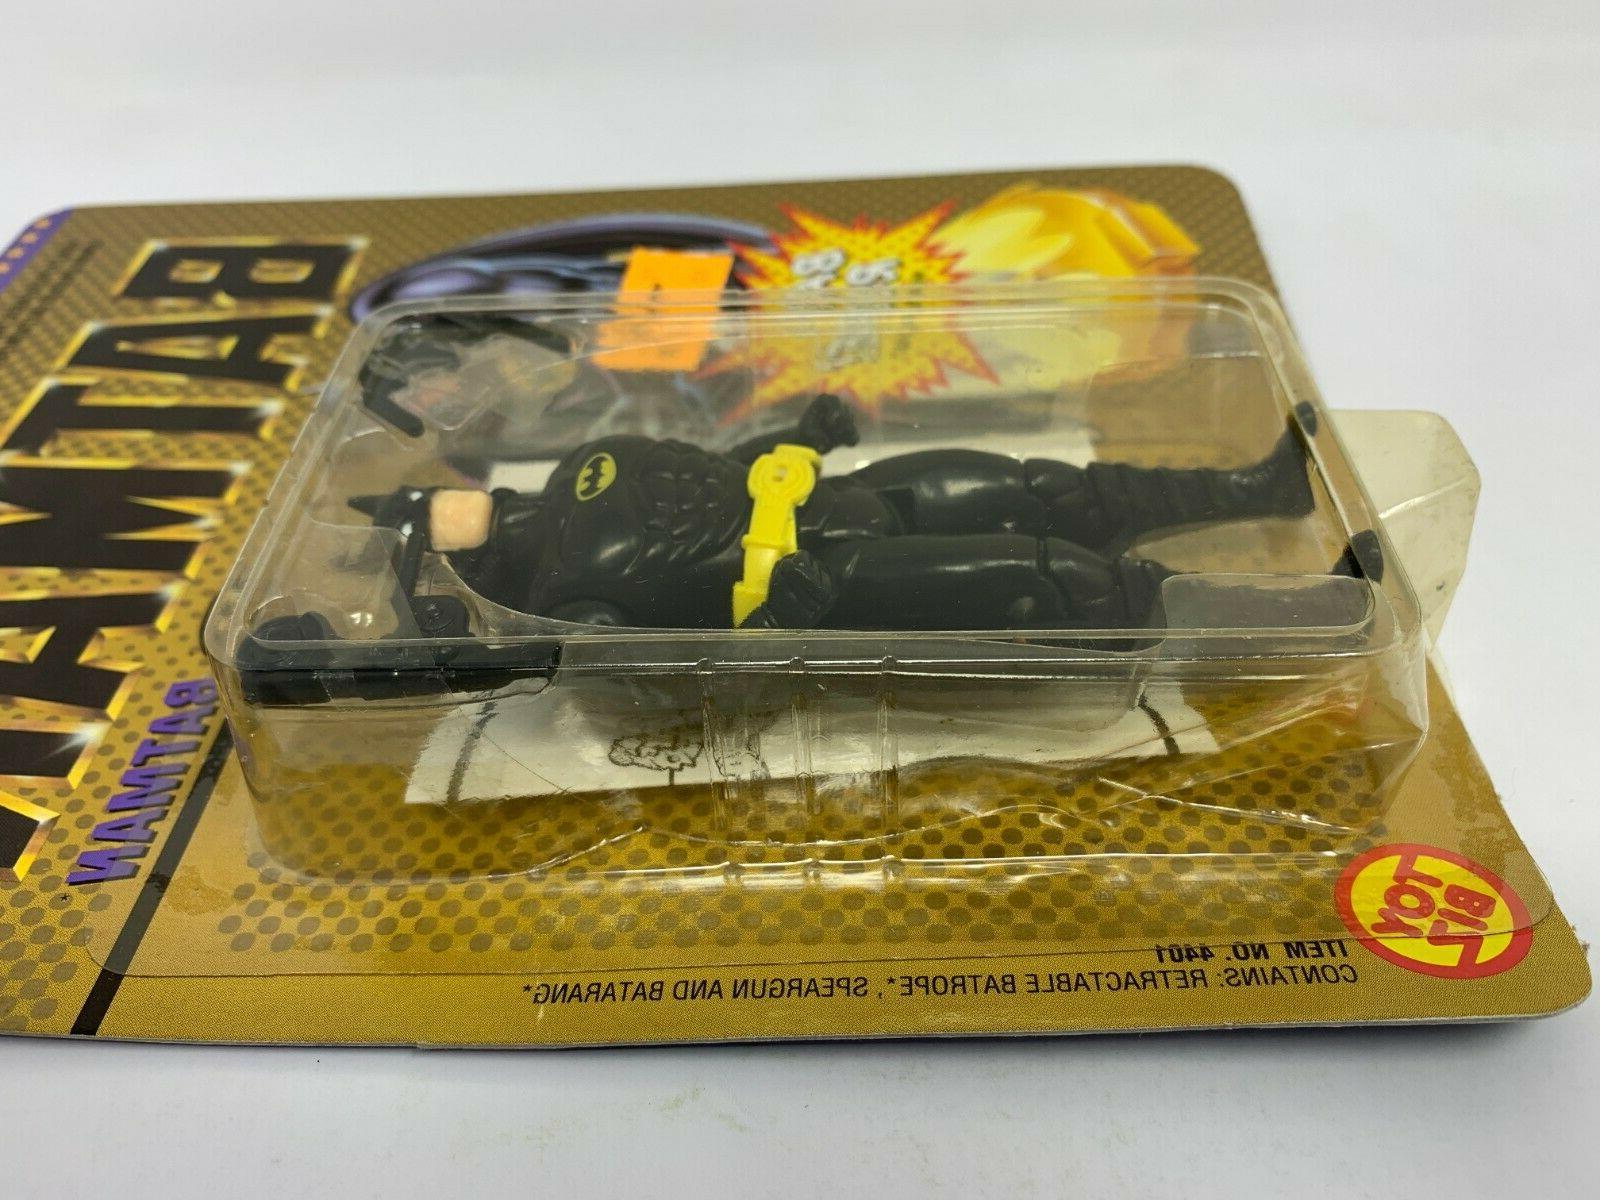 Toy Batman action